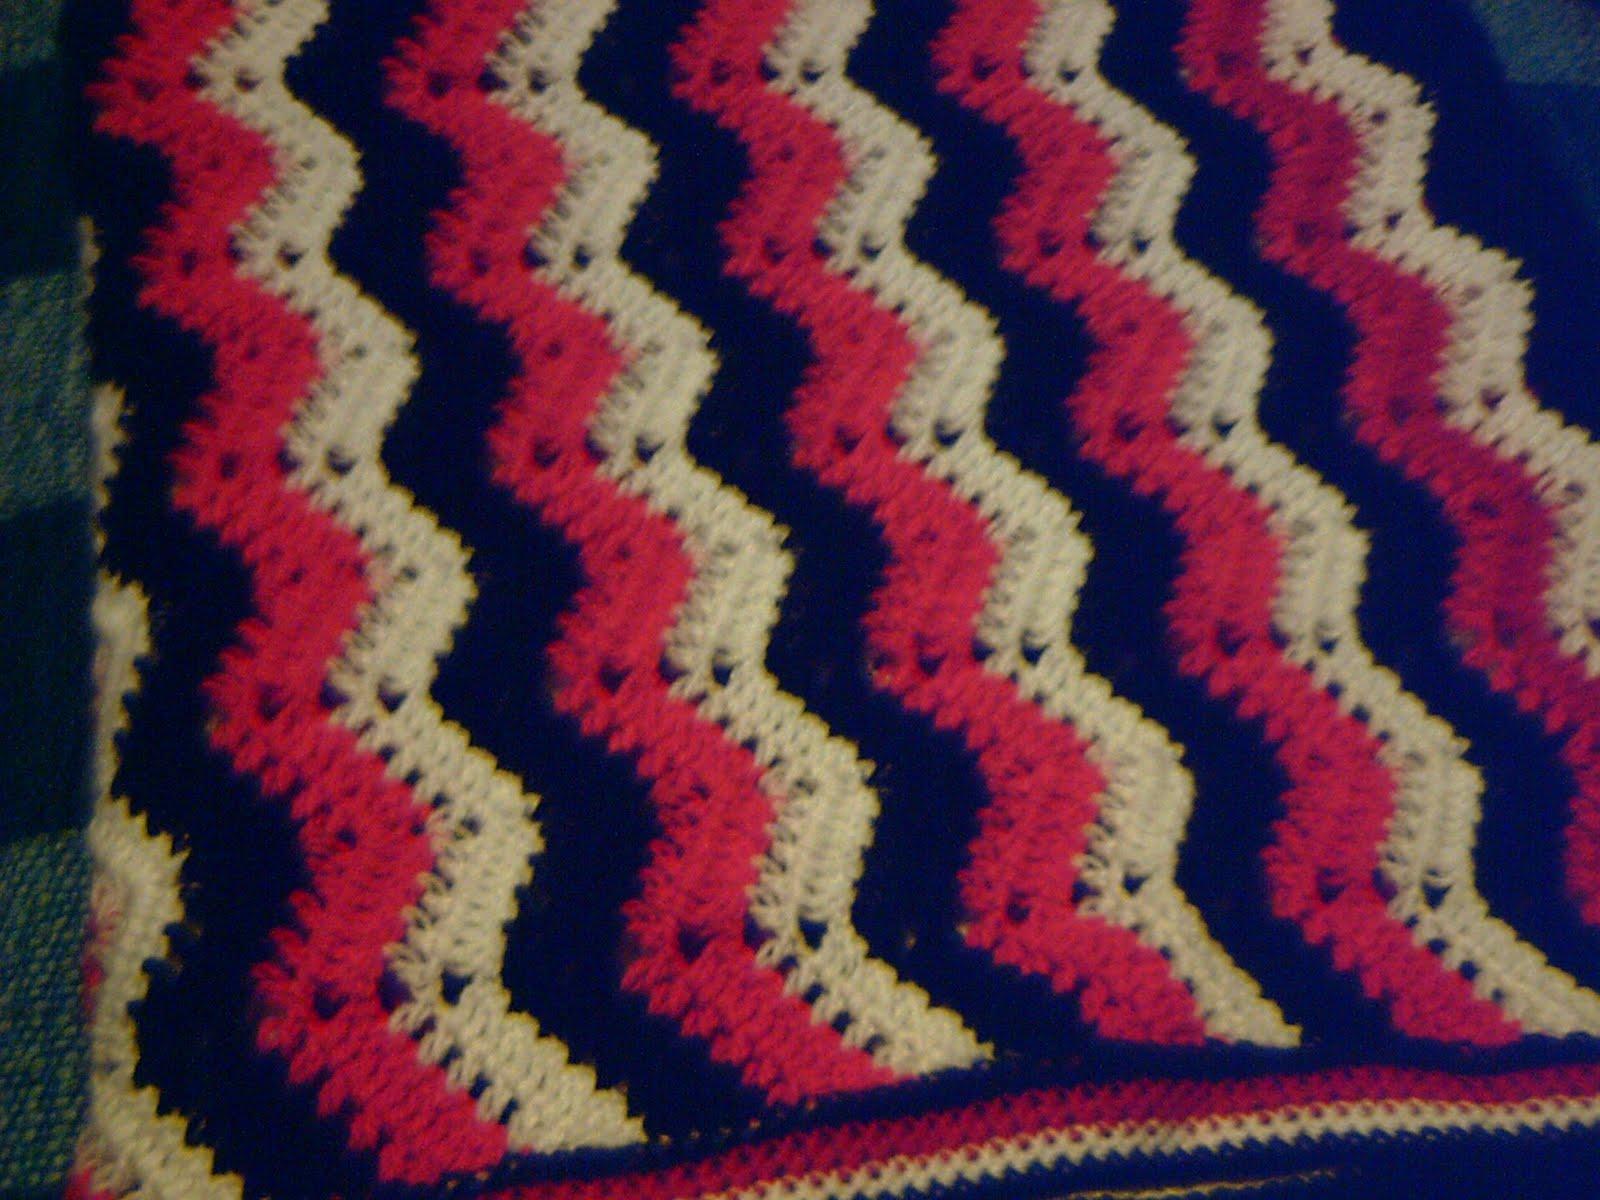 Pie de cama, piecera o manta zig zag, tejida a crochet con aguja nro 2